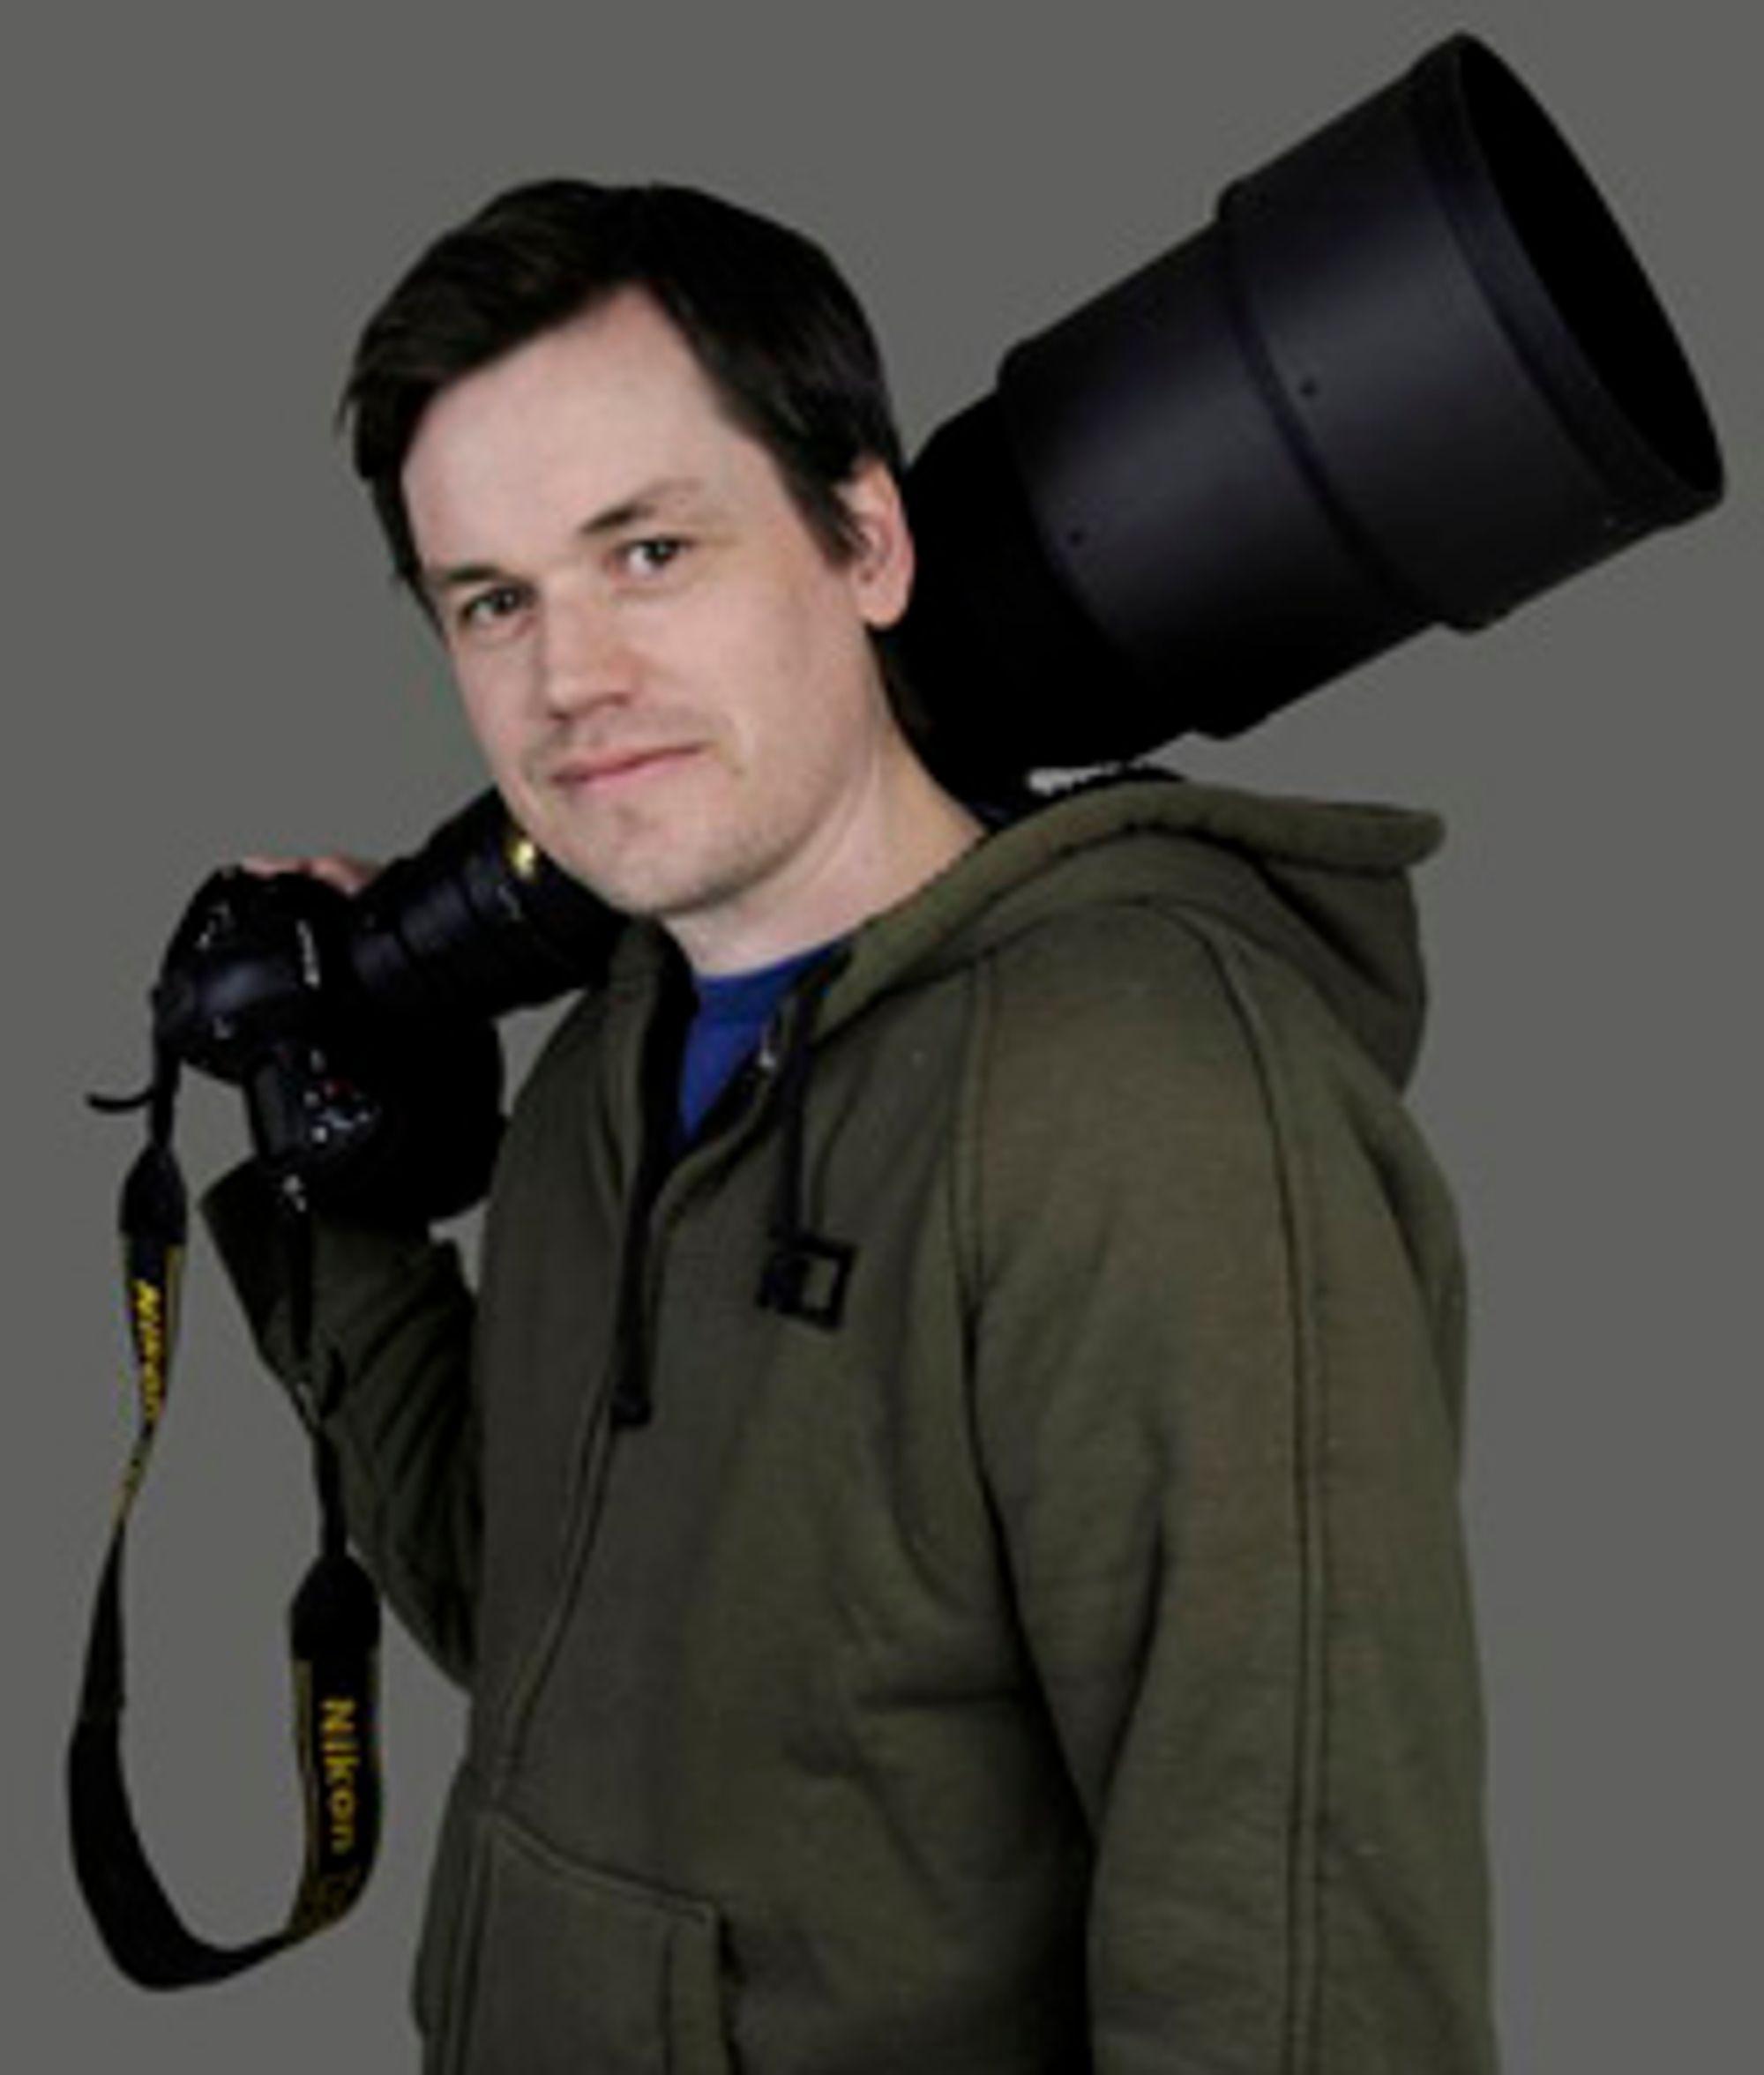 Ole Jørgen Liodden blir Nikon-ambassadør.